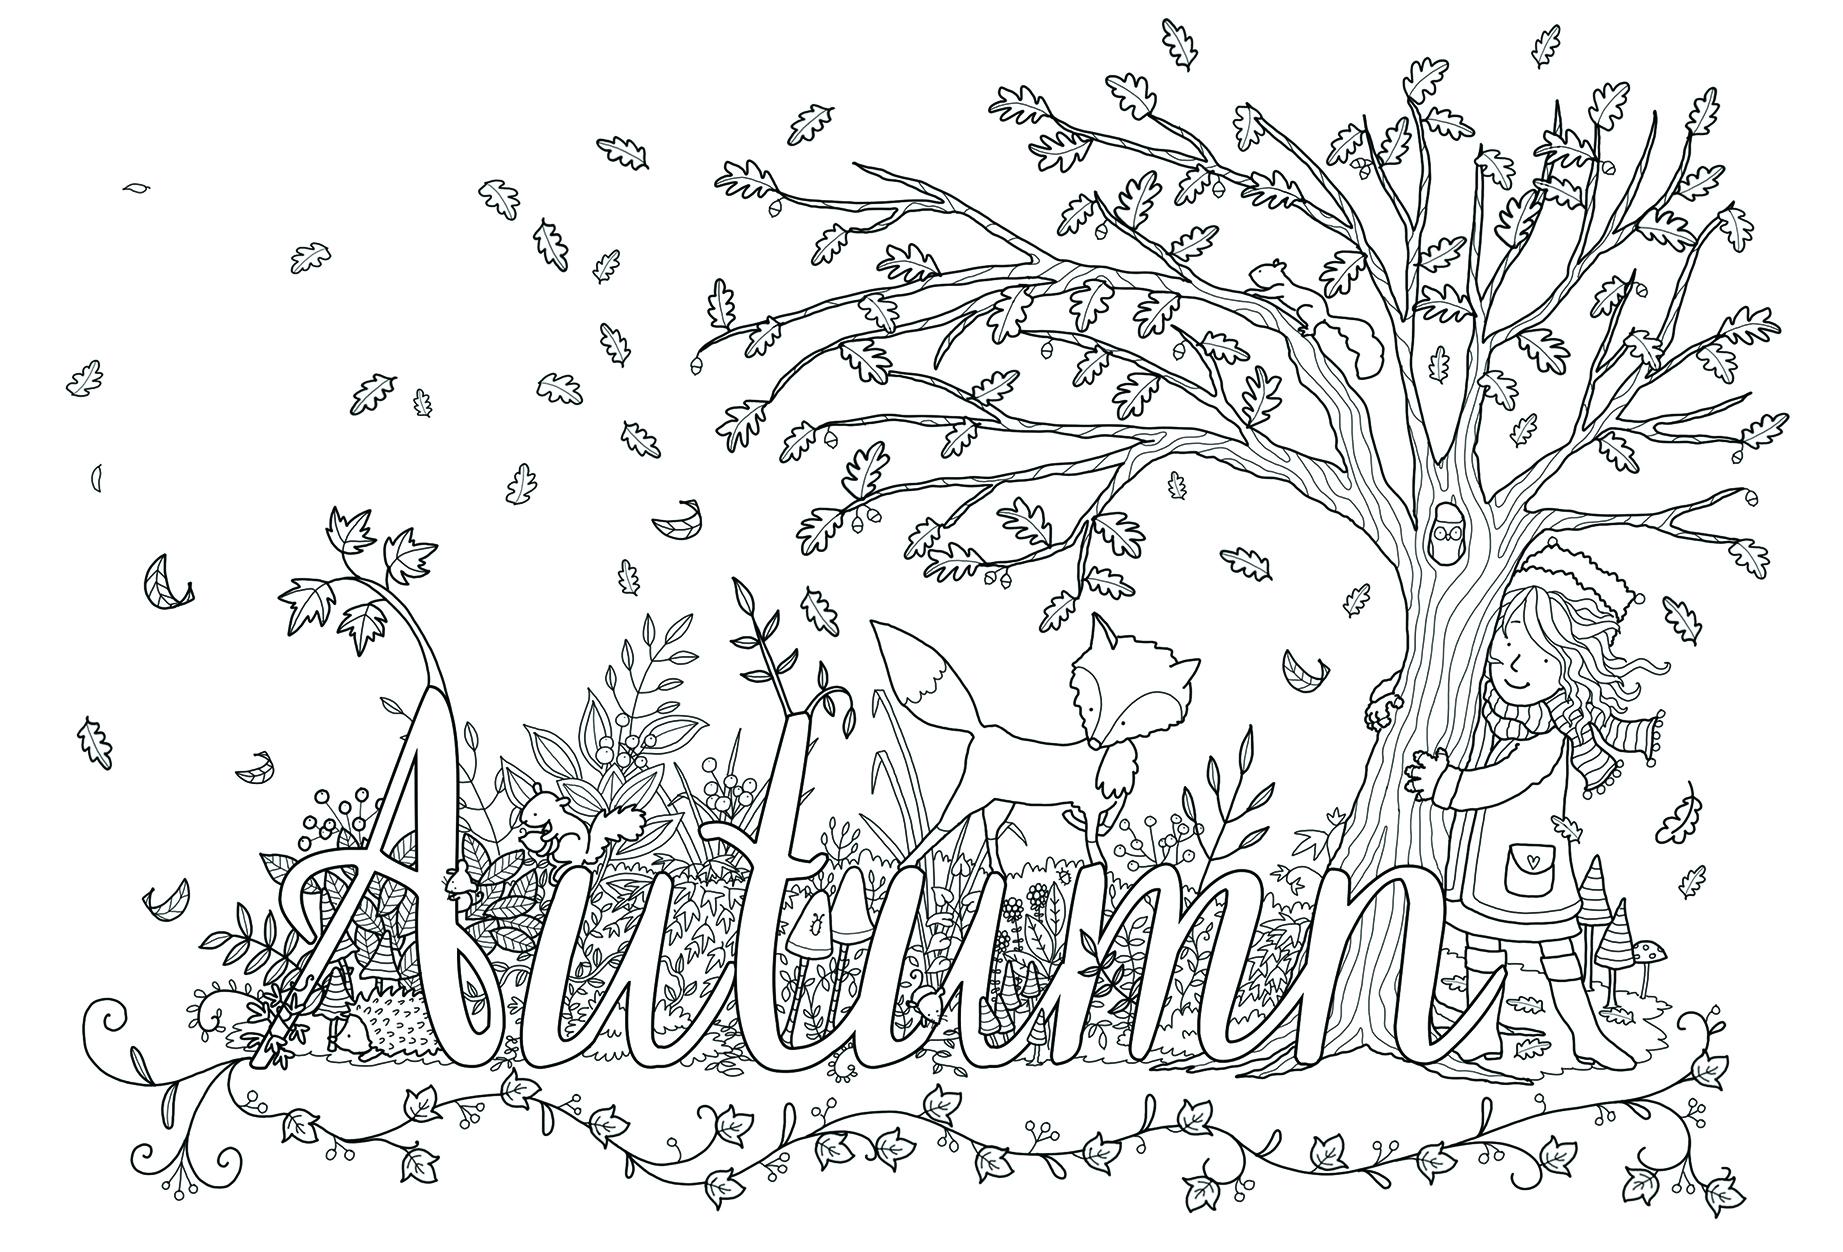 claire keay_autumn adult colouring line art